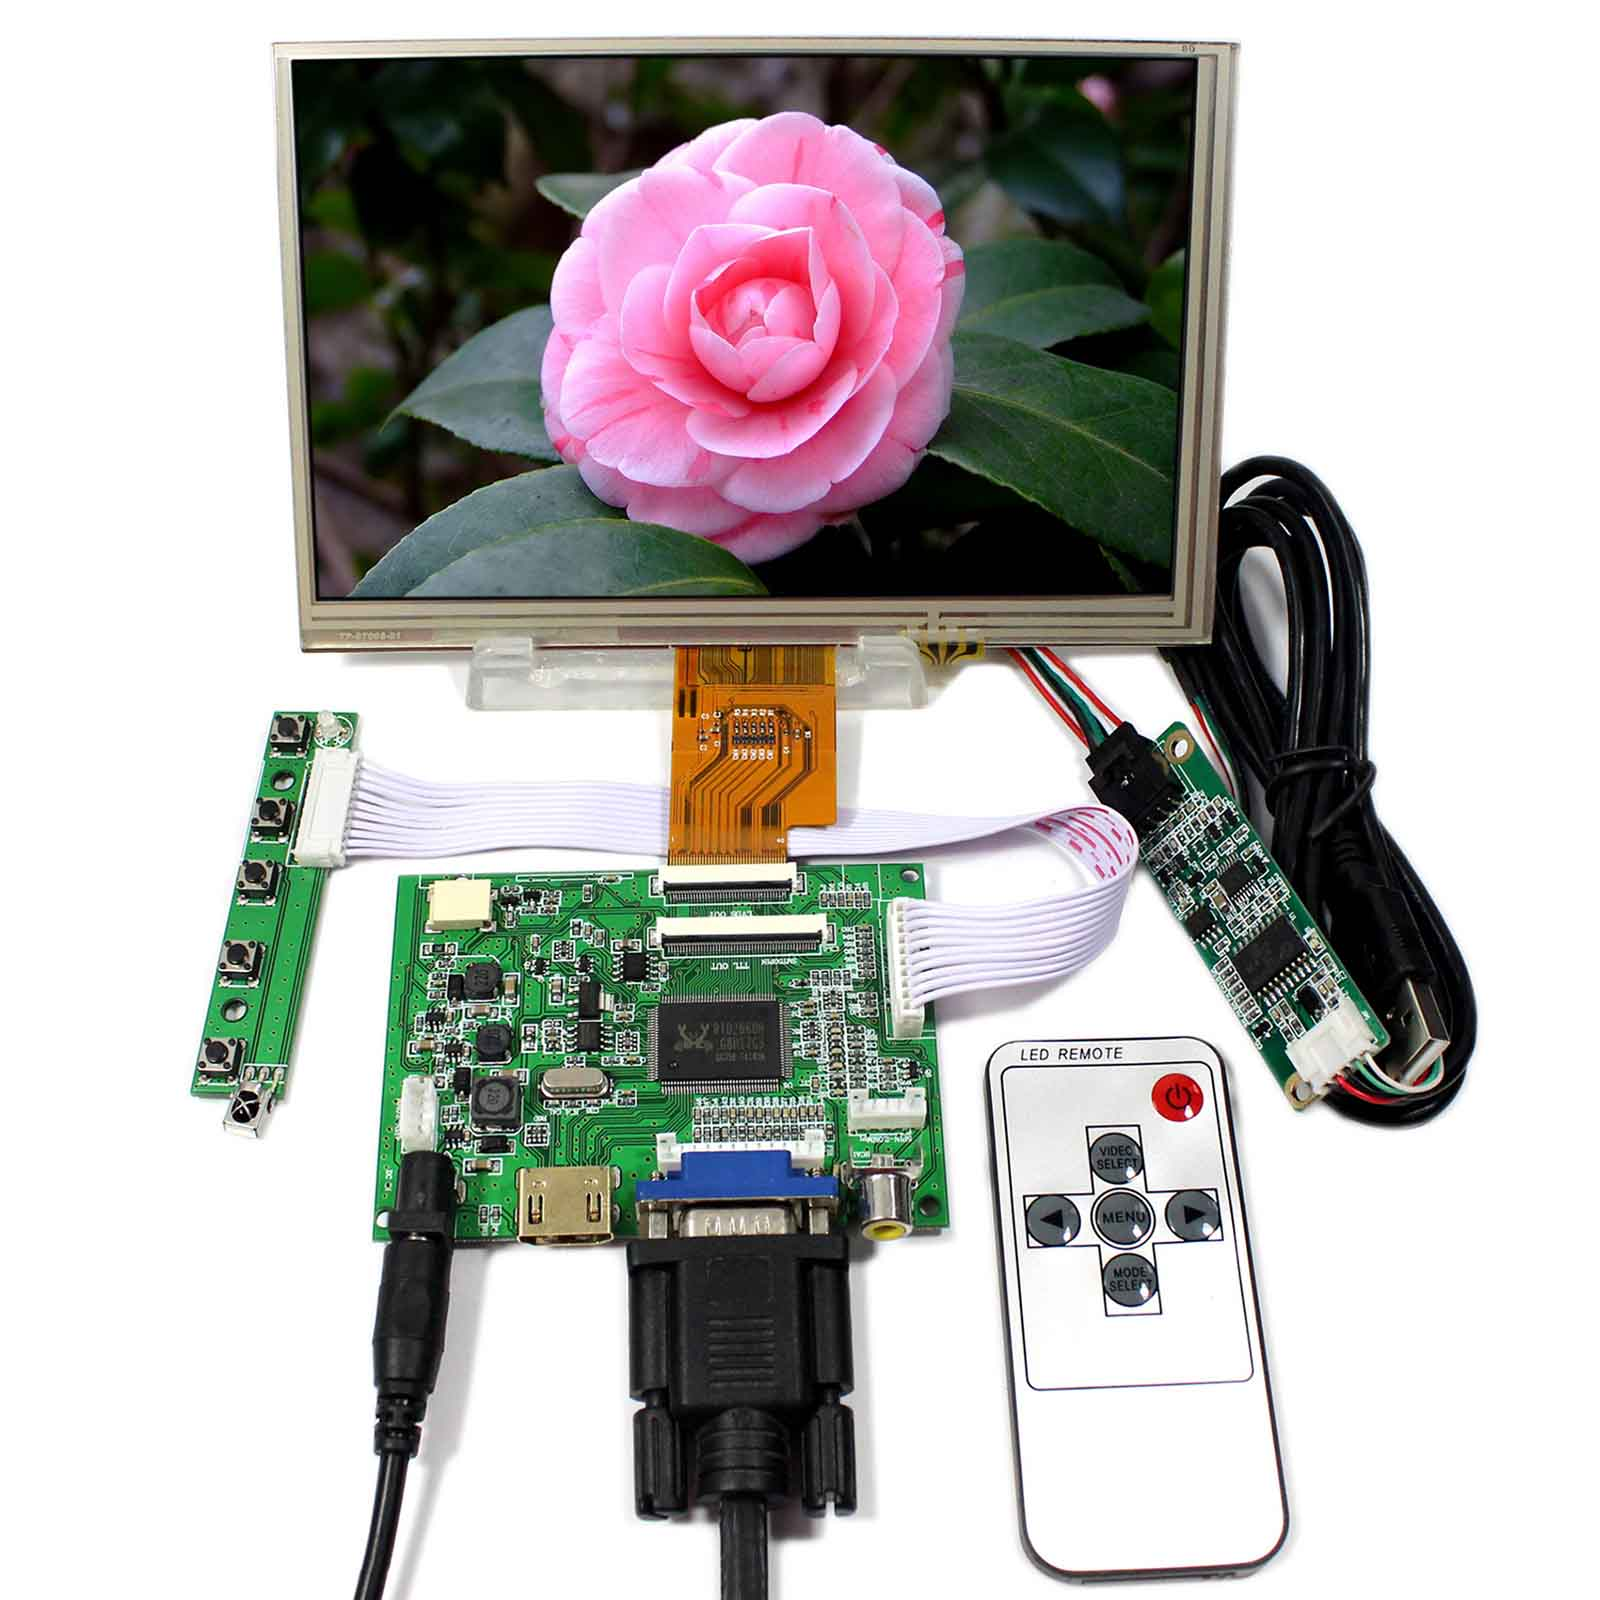 HDMI+VGA+2AV LCD Controller Board VS-TY2662-V5 With 7inch 1024x600 AT070TNA2 LCD With Resistive Touch vga 2av reversing lcd controller board with 7inch 1024x600 at070tna2 lcd screen